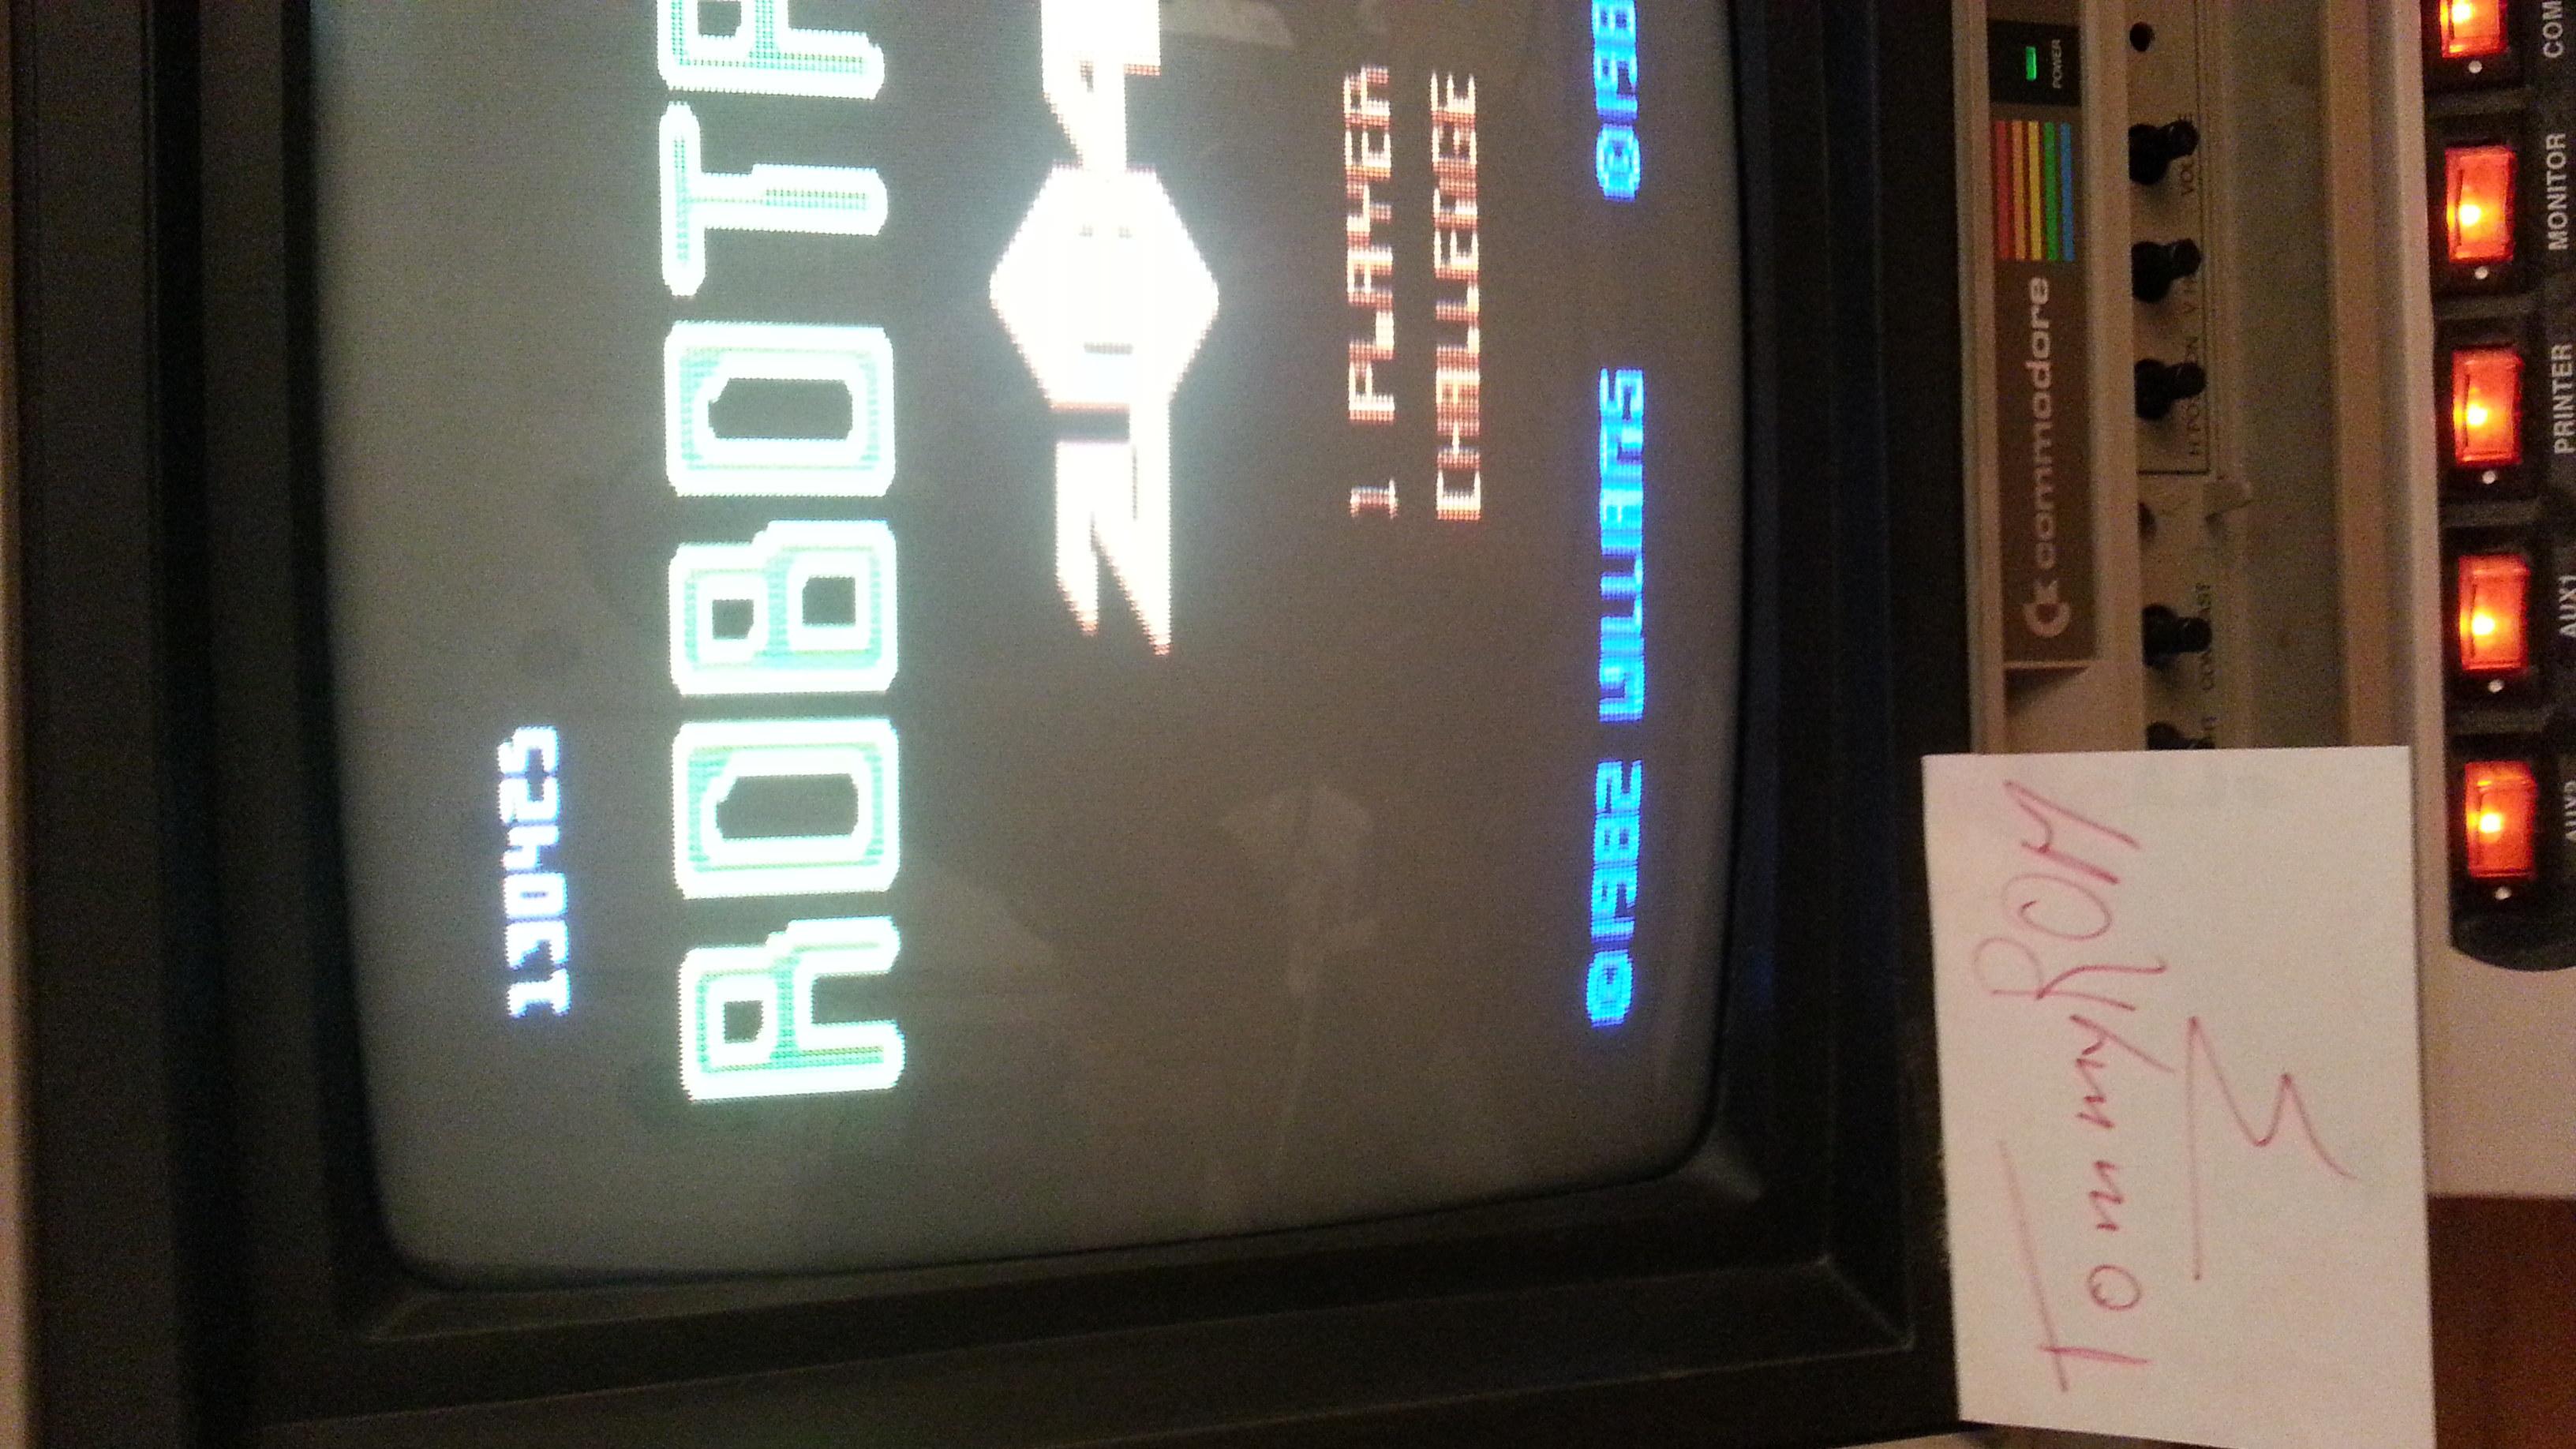 Robotron 2084: Challenge 130,425 points